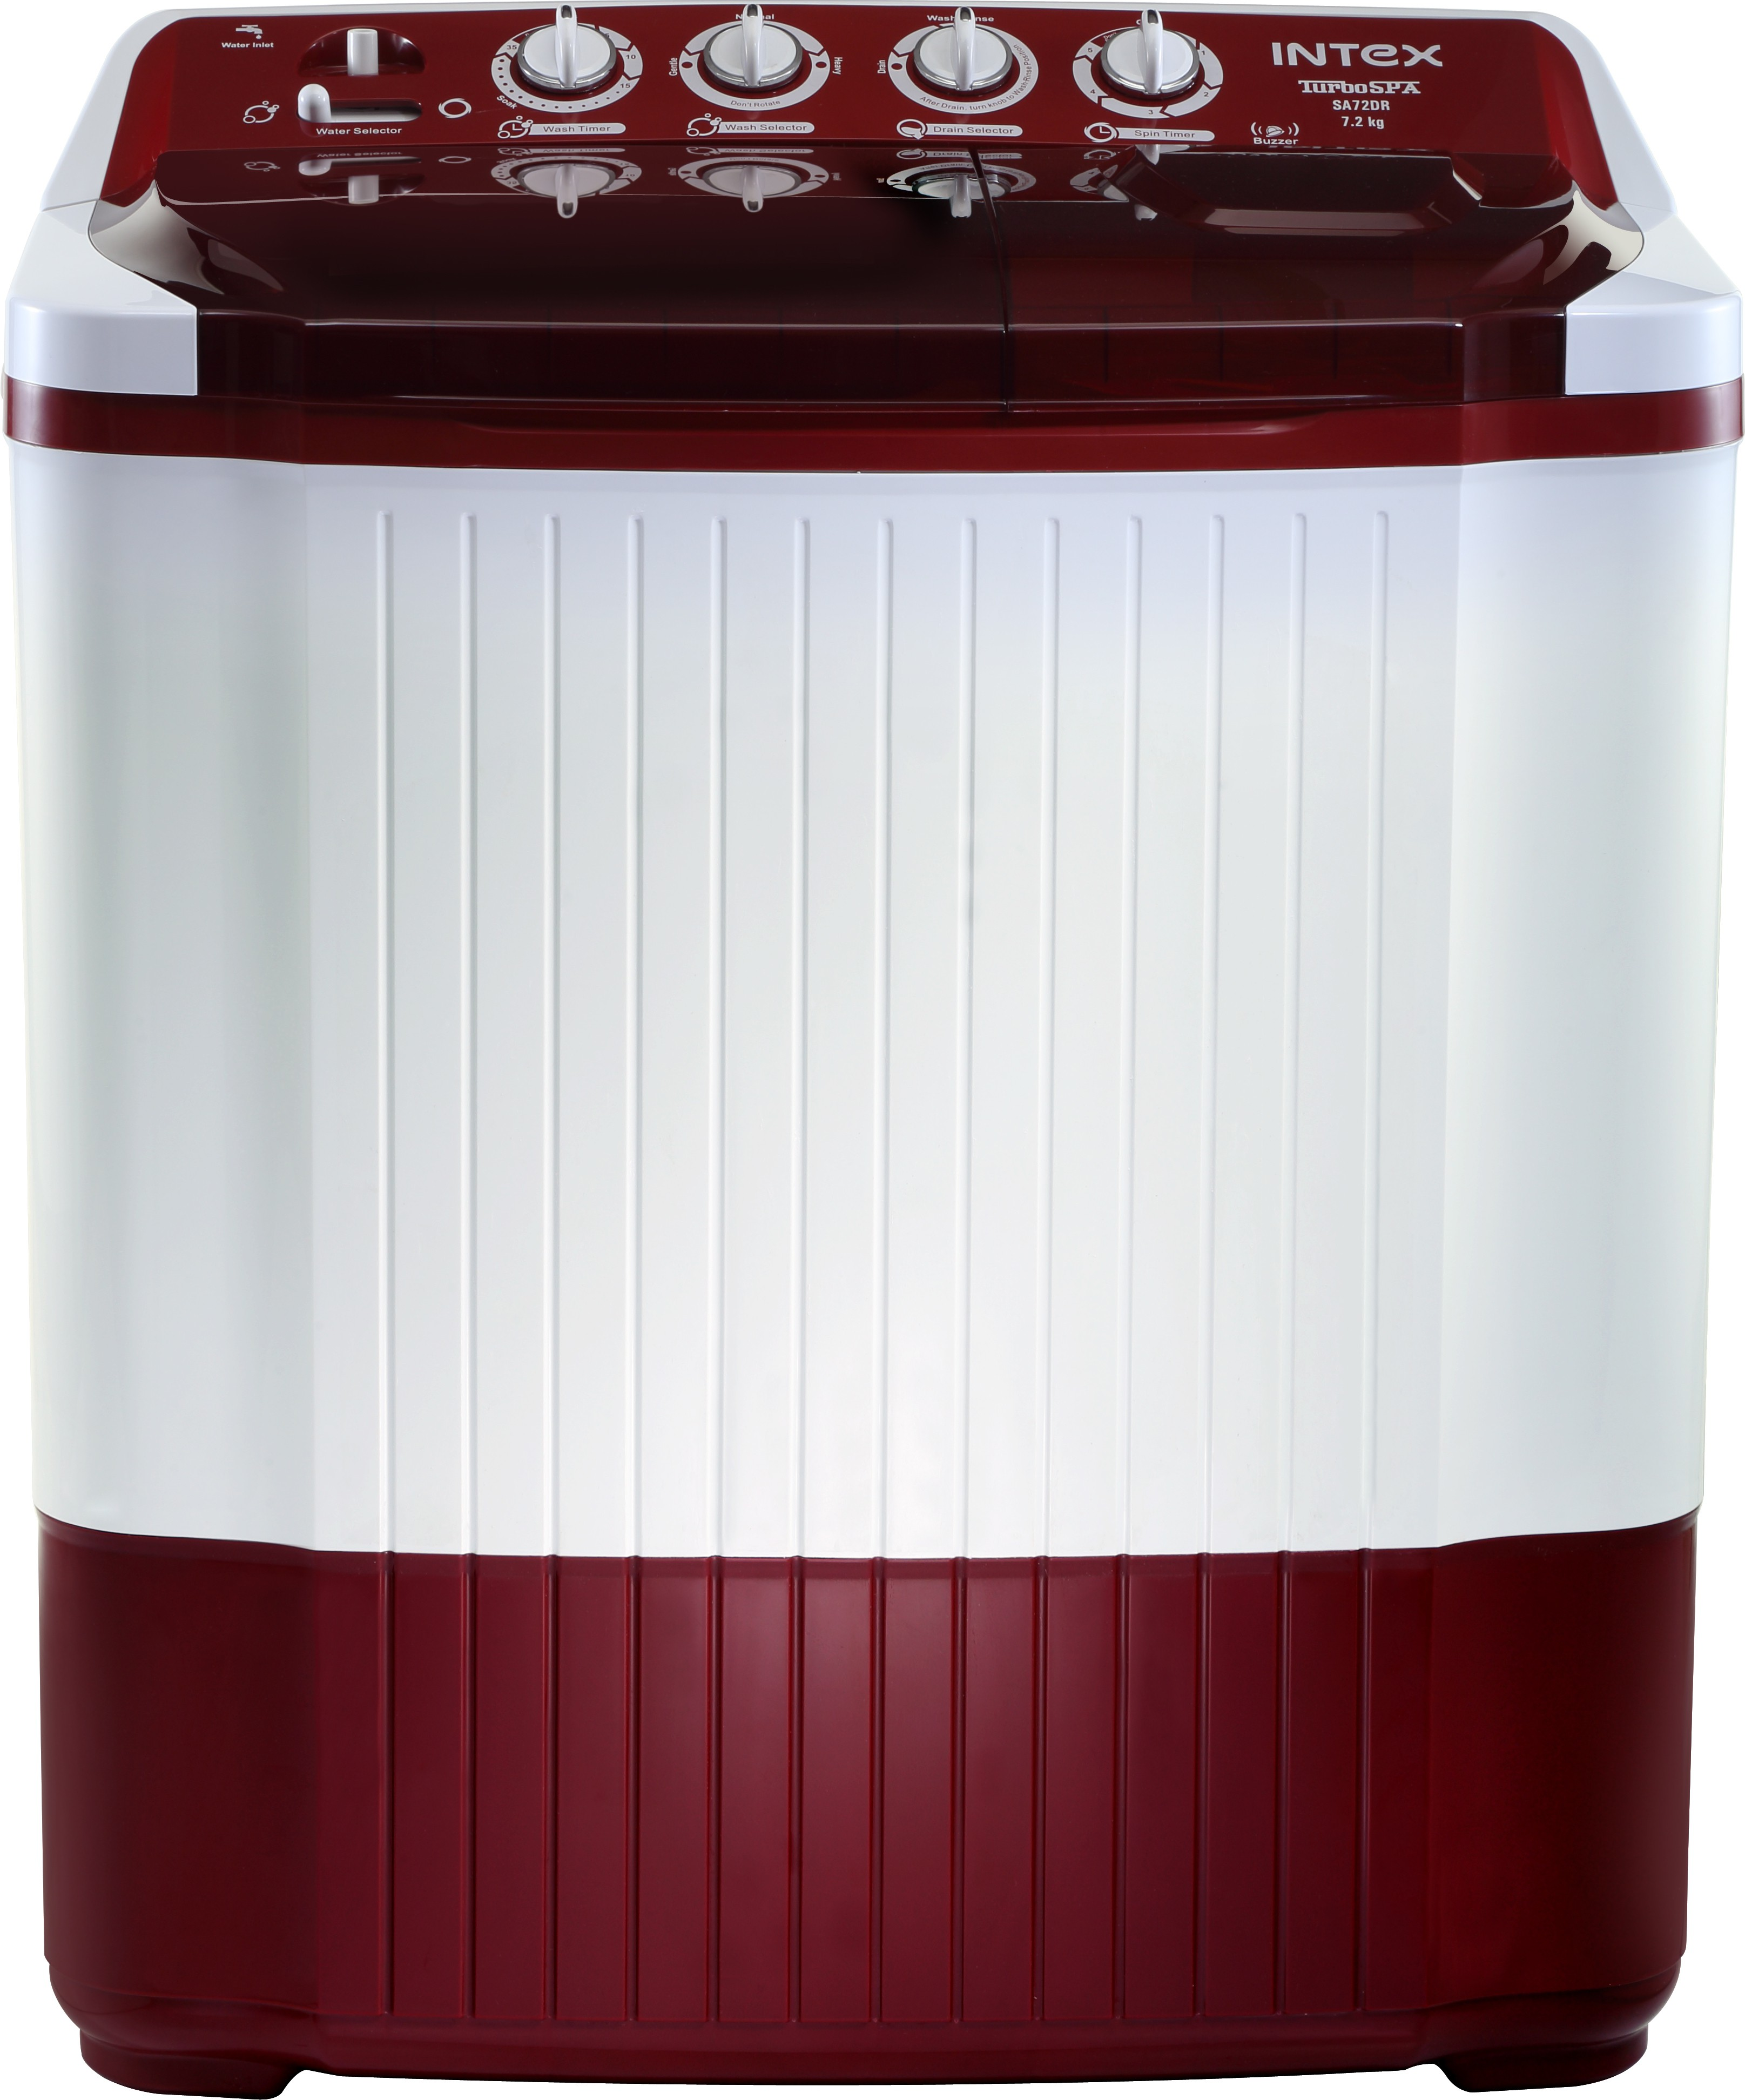 INTEX WM SA72DR-CVP 7.2KG Semi Automatic Top Load Washing Machine